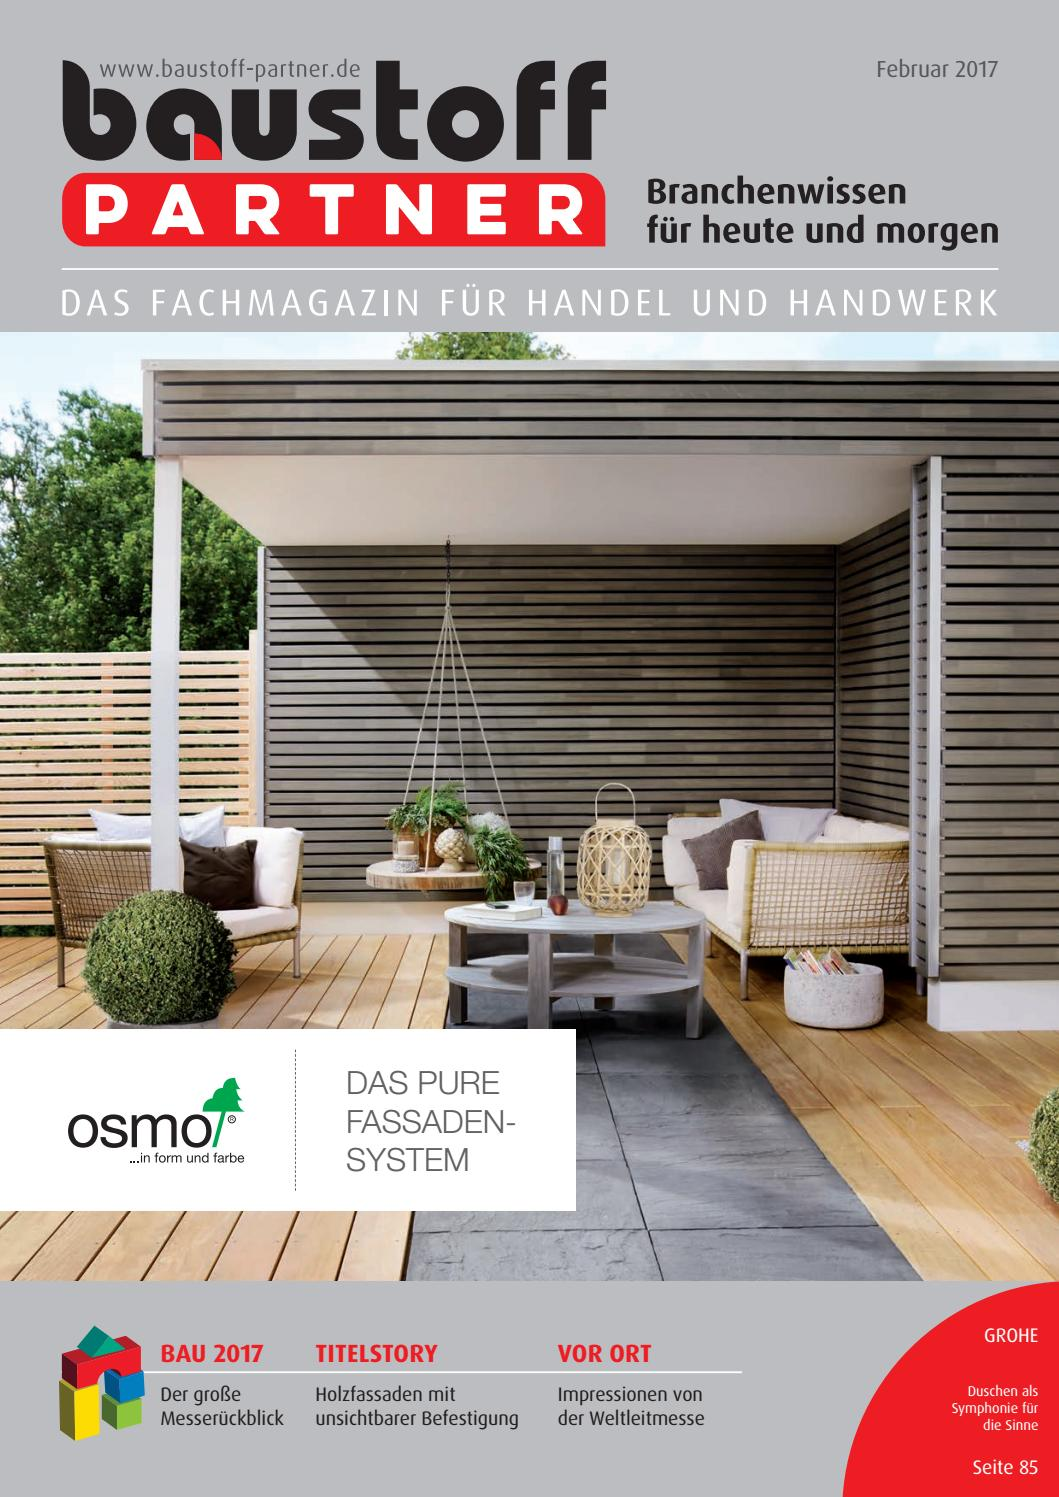 Full Size of Baustoffpartner Februar 2017 By Sbm Verlag Gmbh Drutex Fenster Test Wohnzimmer Drutex Erfahrungen Forum